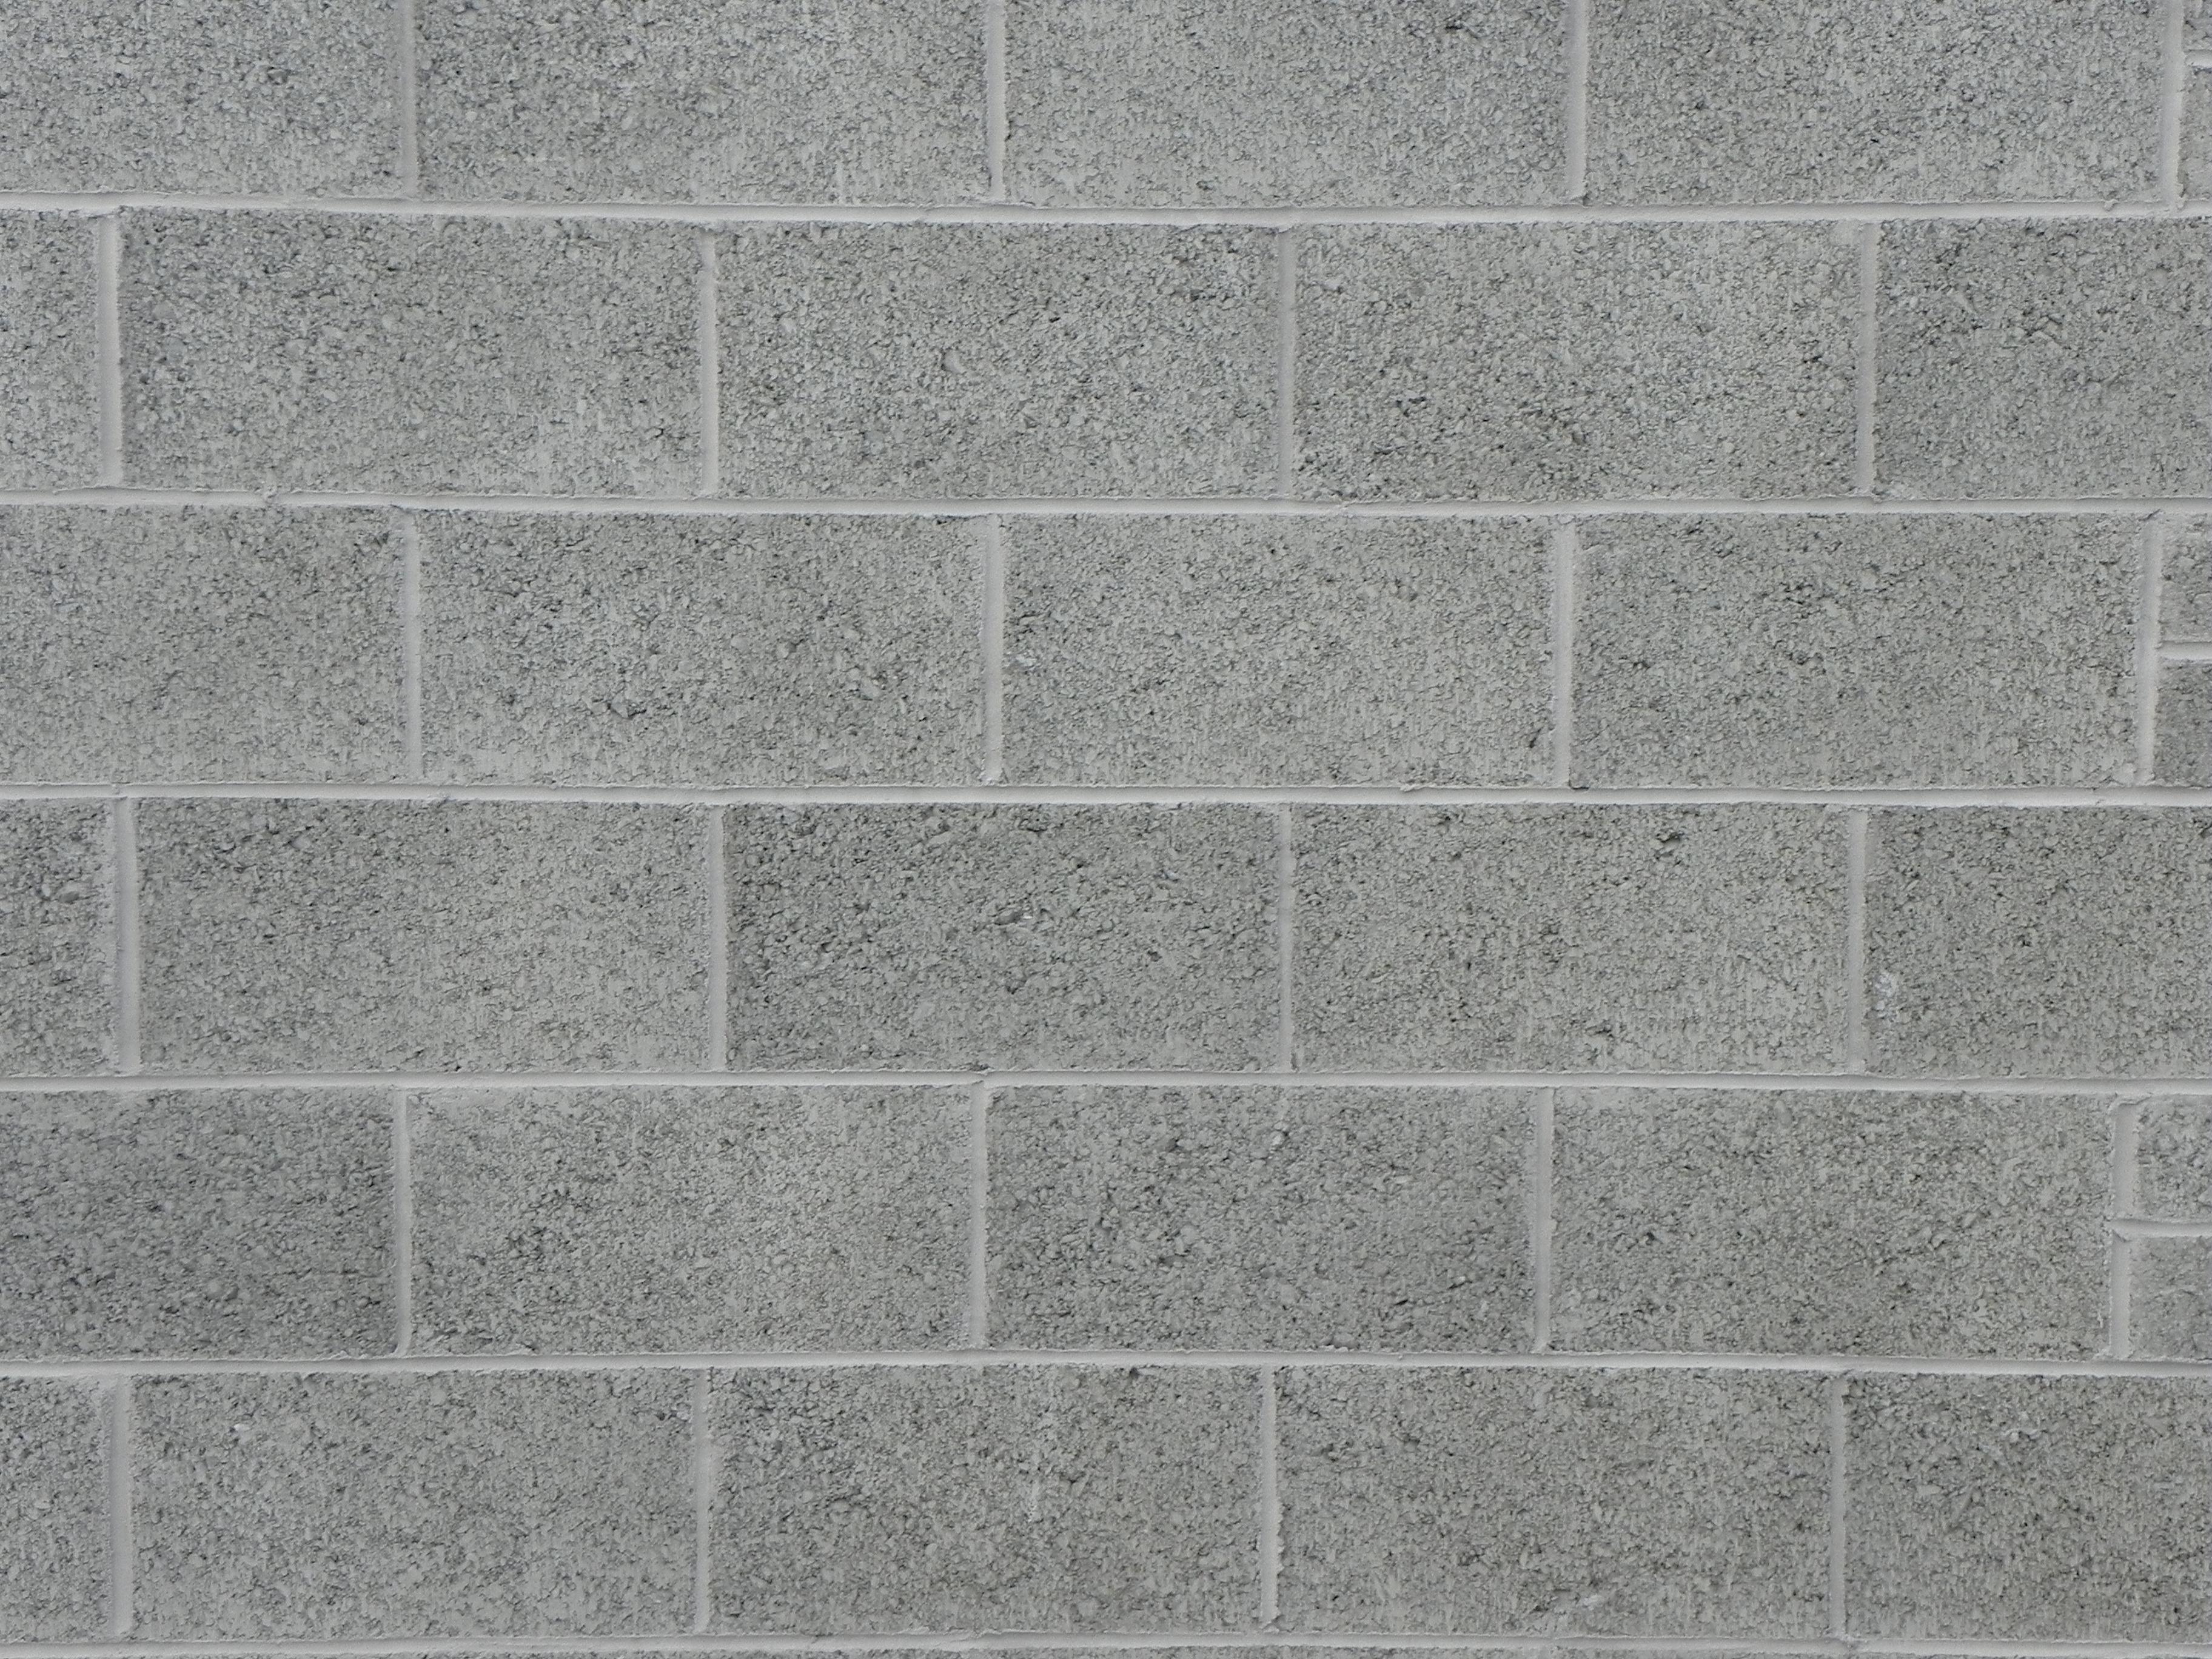 110 Block And 66 Block